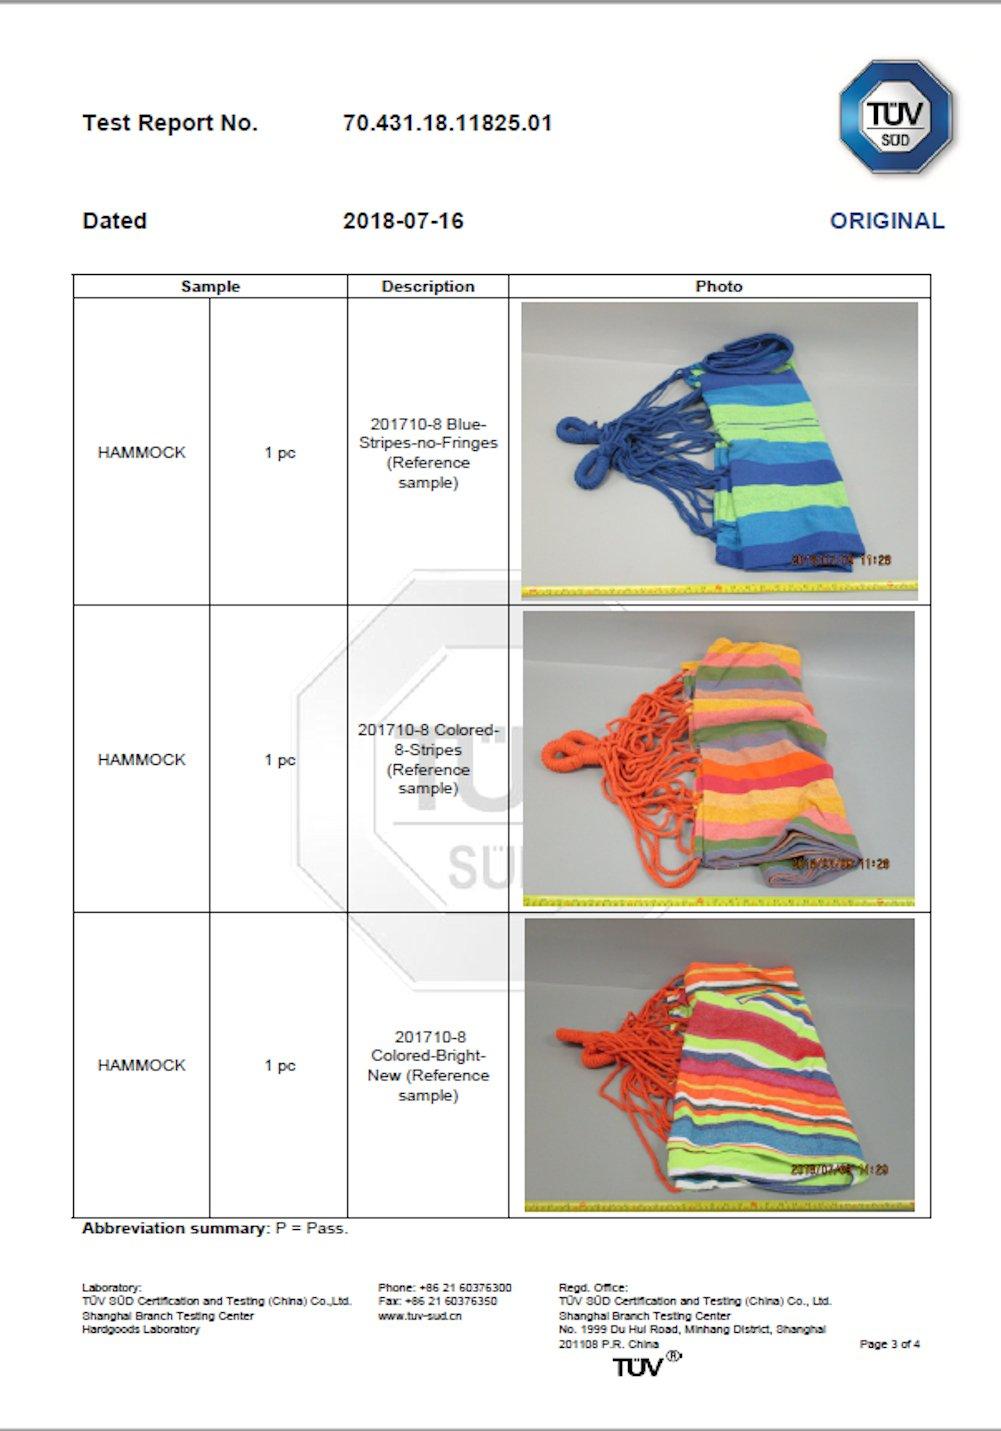 Corona Burg Hamaca m/ás Personas 210/x 150/cm 6/Colored Stripes soporta hasta 300/kg